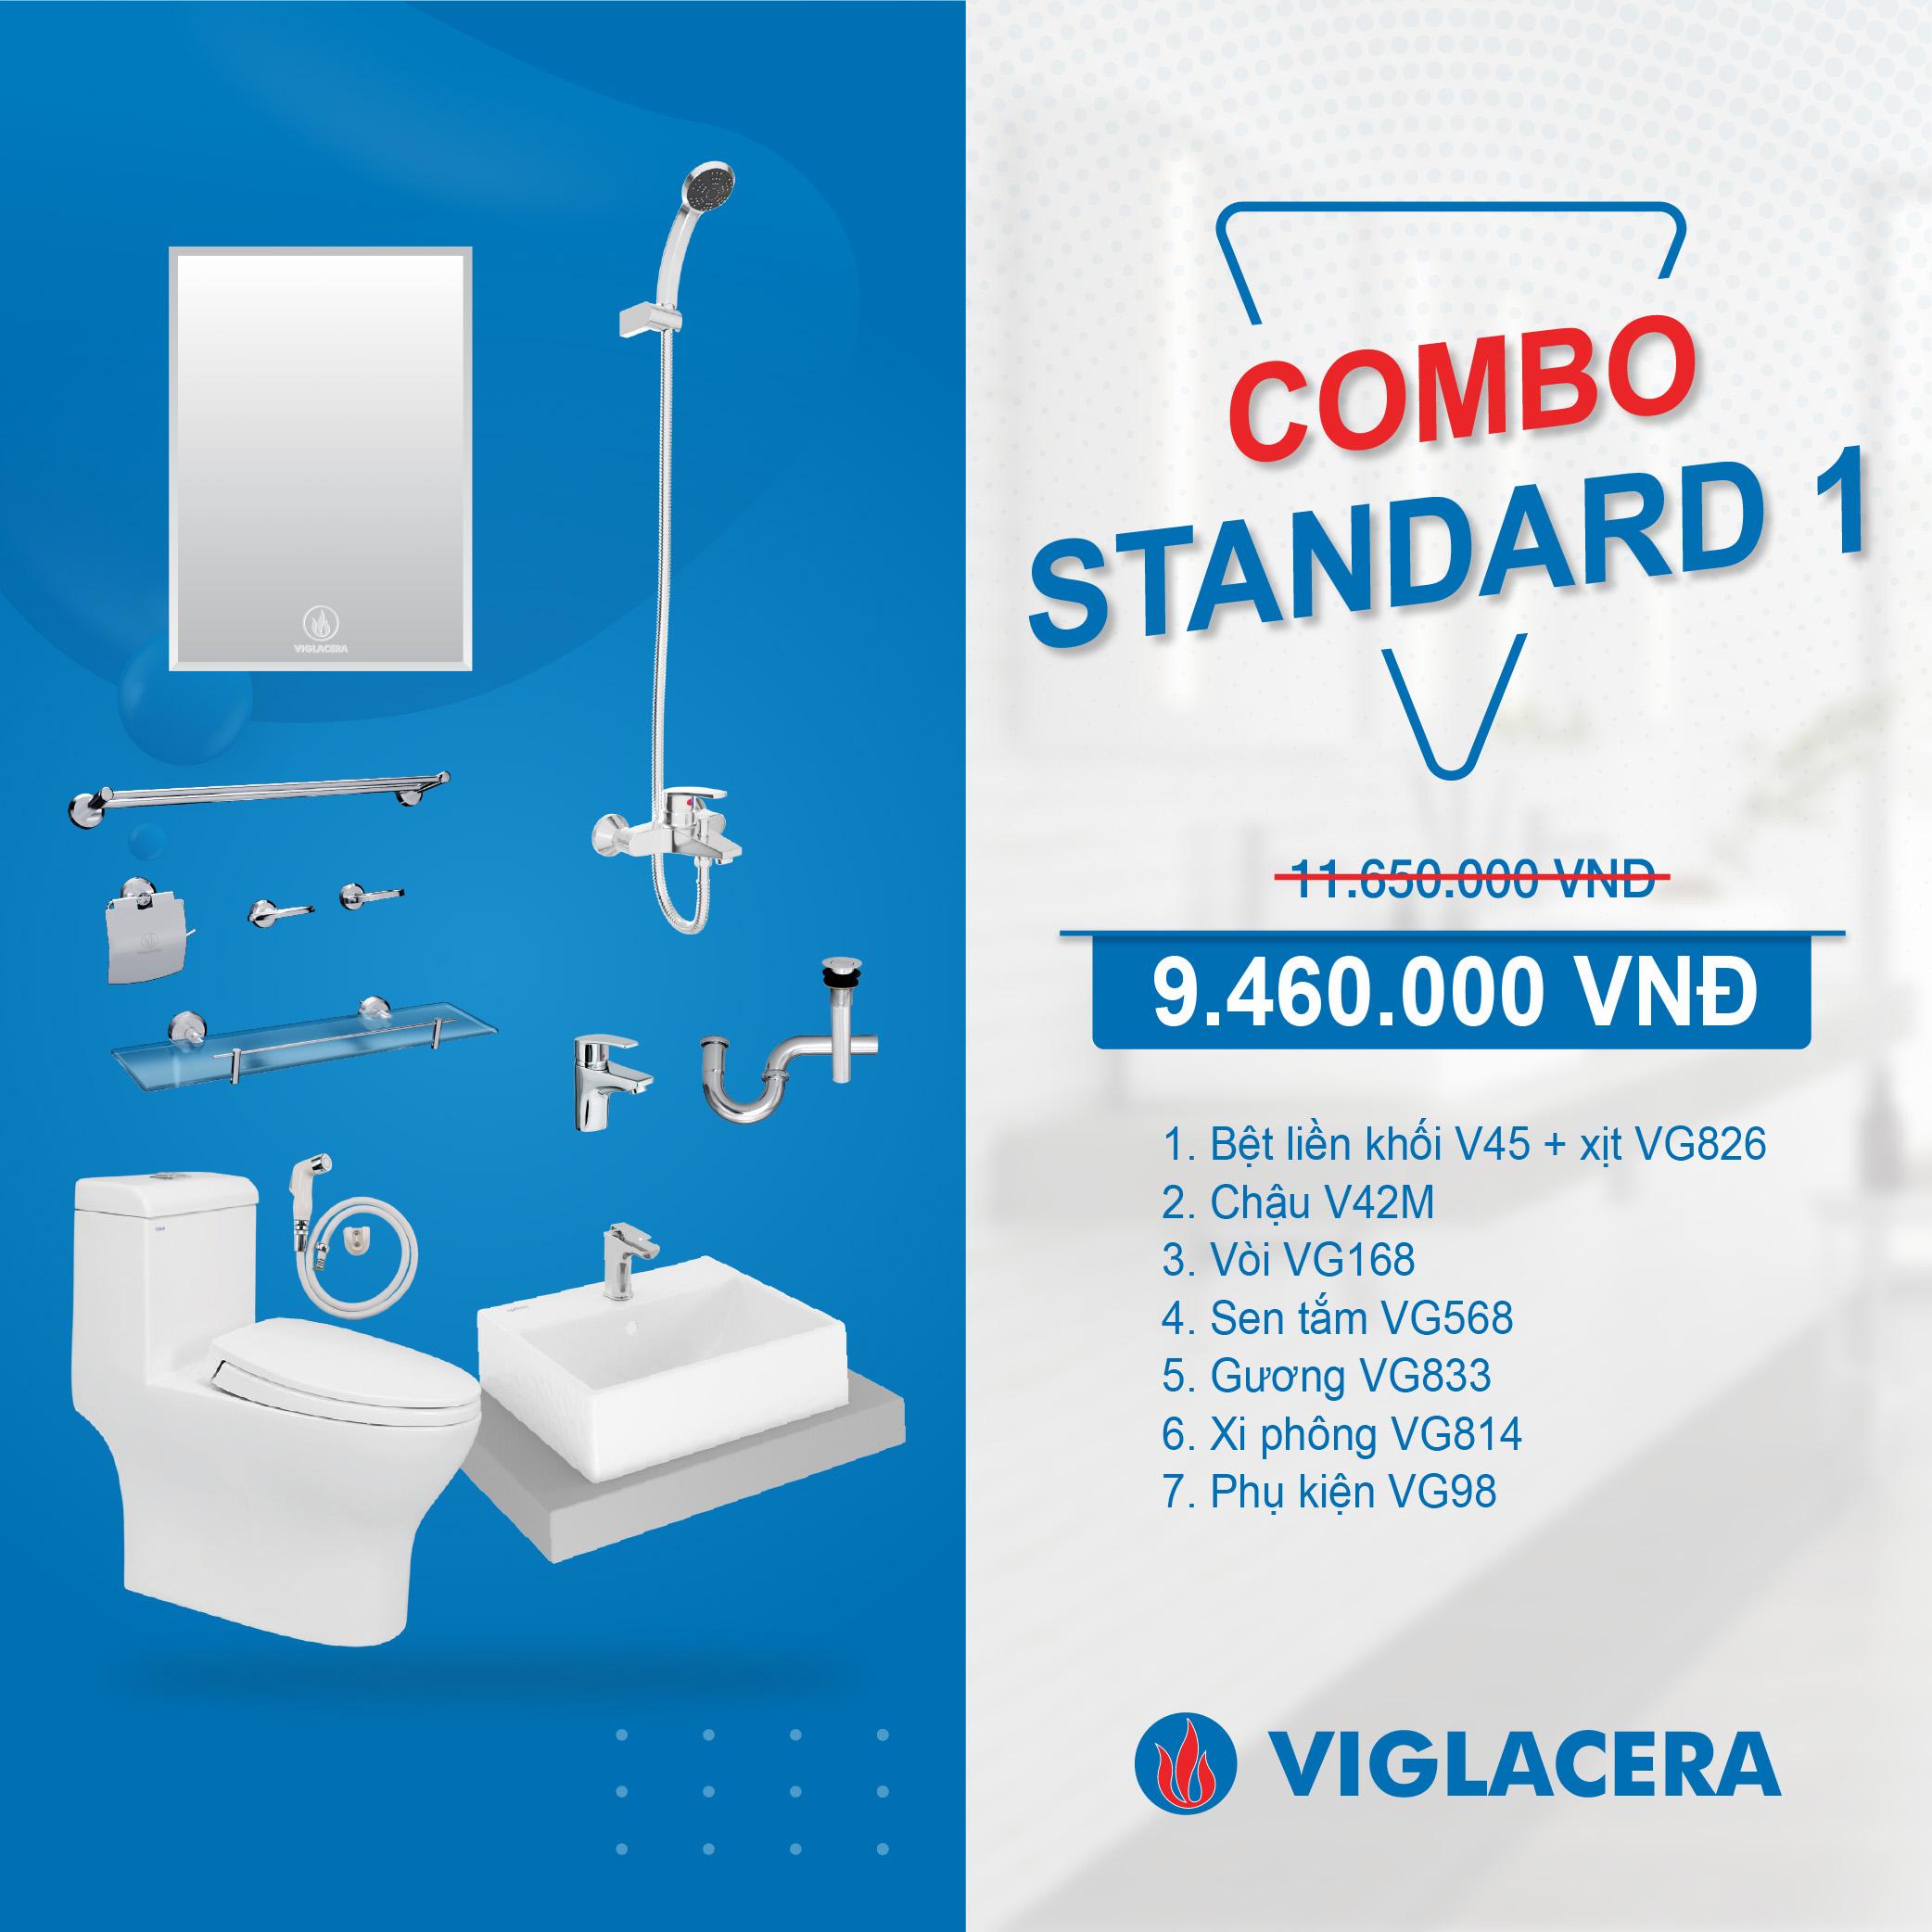 Combo Viglacera Standard 1